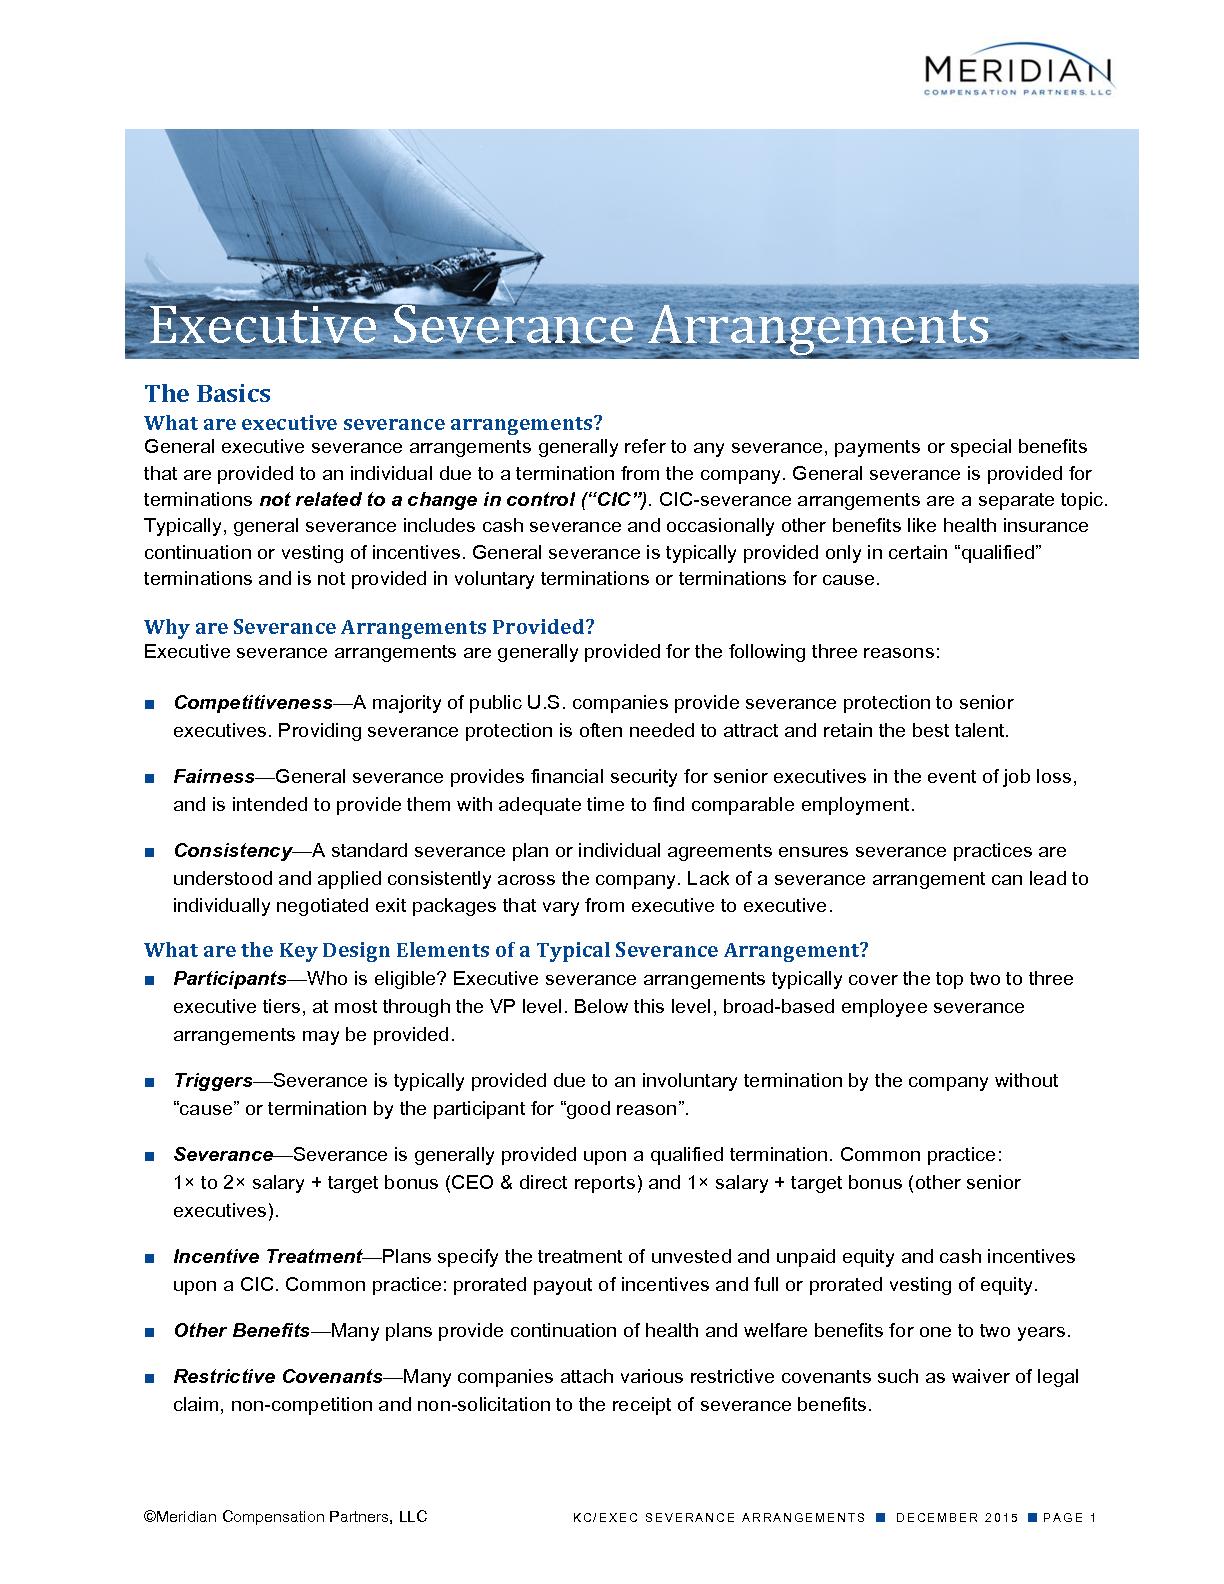 Executive Severance Arrangements (PDF)